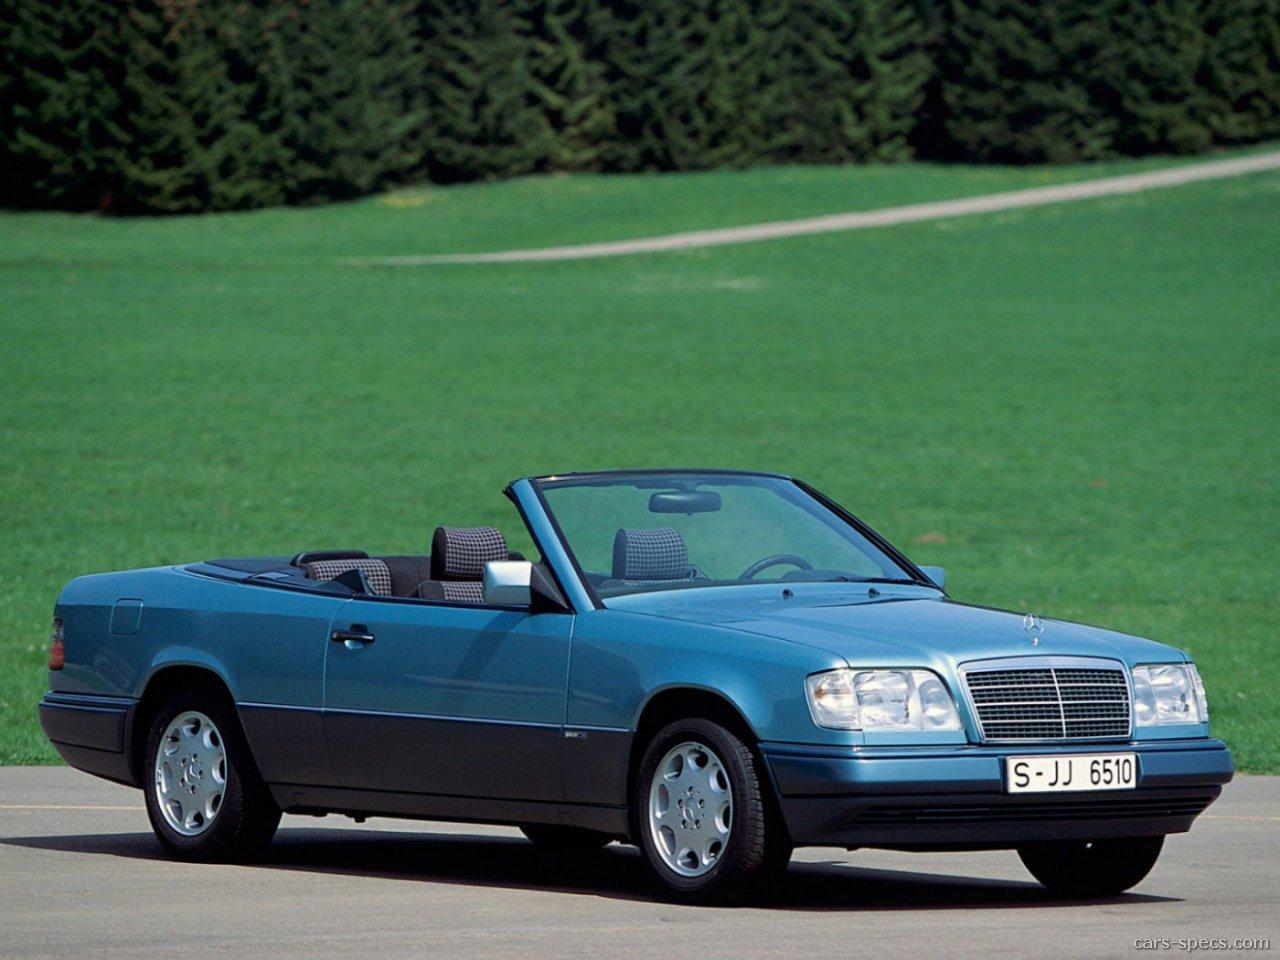 1995 mercedes benz e class convertible specifications for Mercedes benz e350 convertible for sale